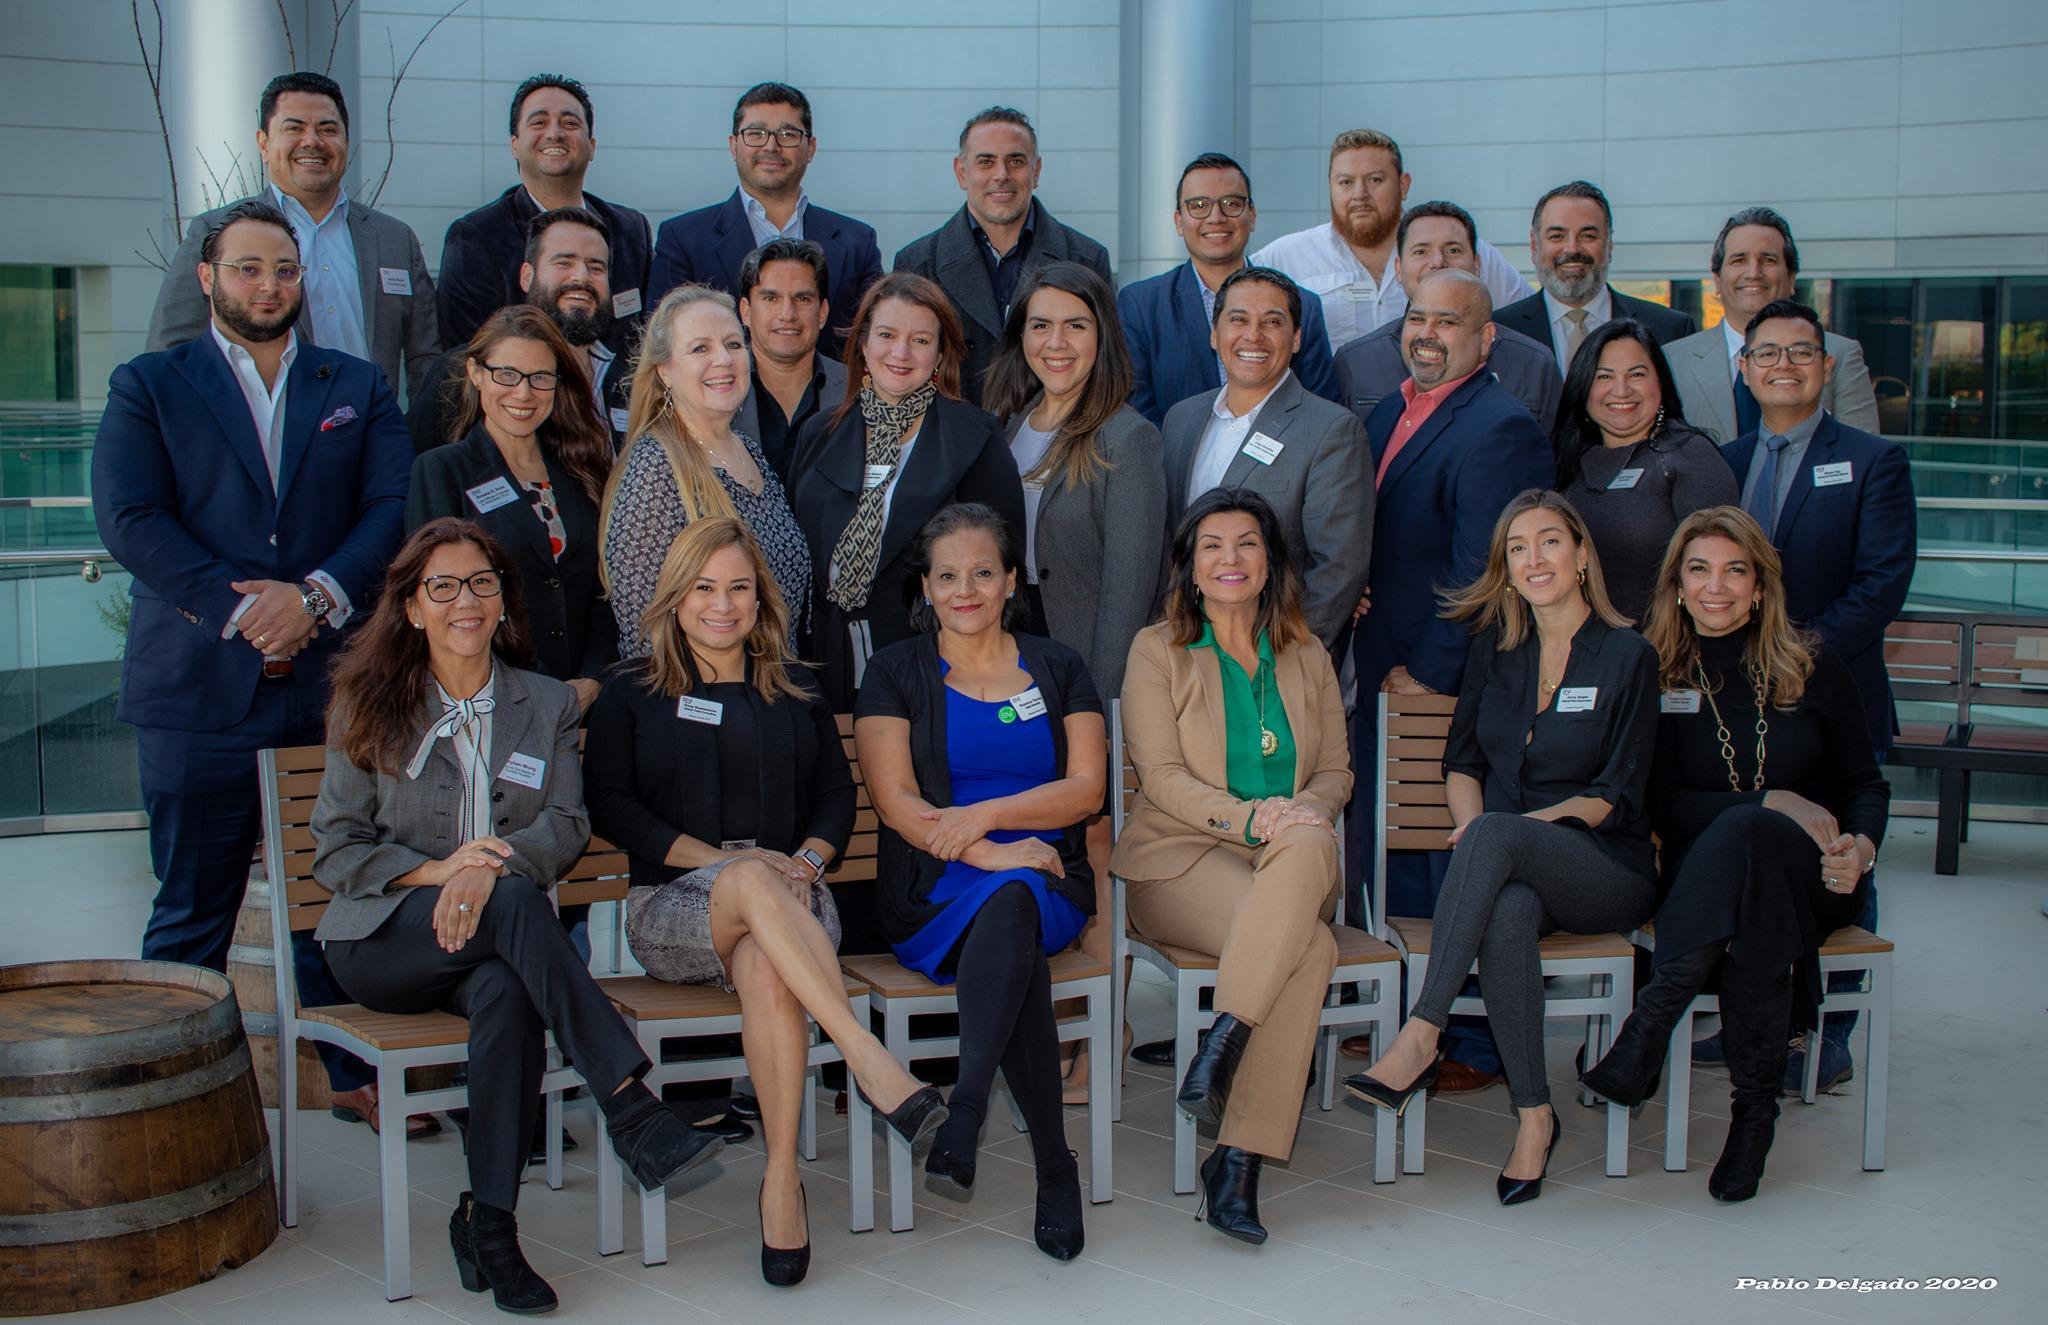 BNI Latino Virtual Meeting - Featured Speaker: Susana Sosa - Inmigration Attorney